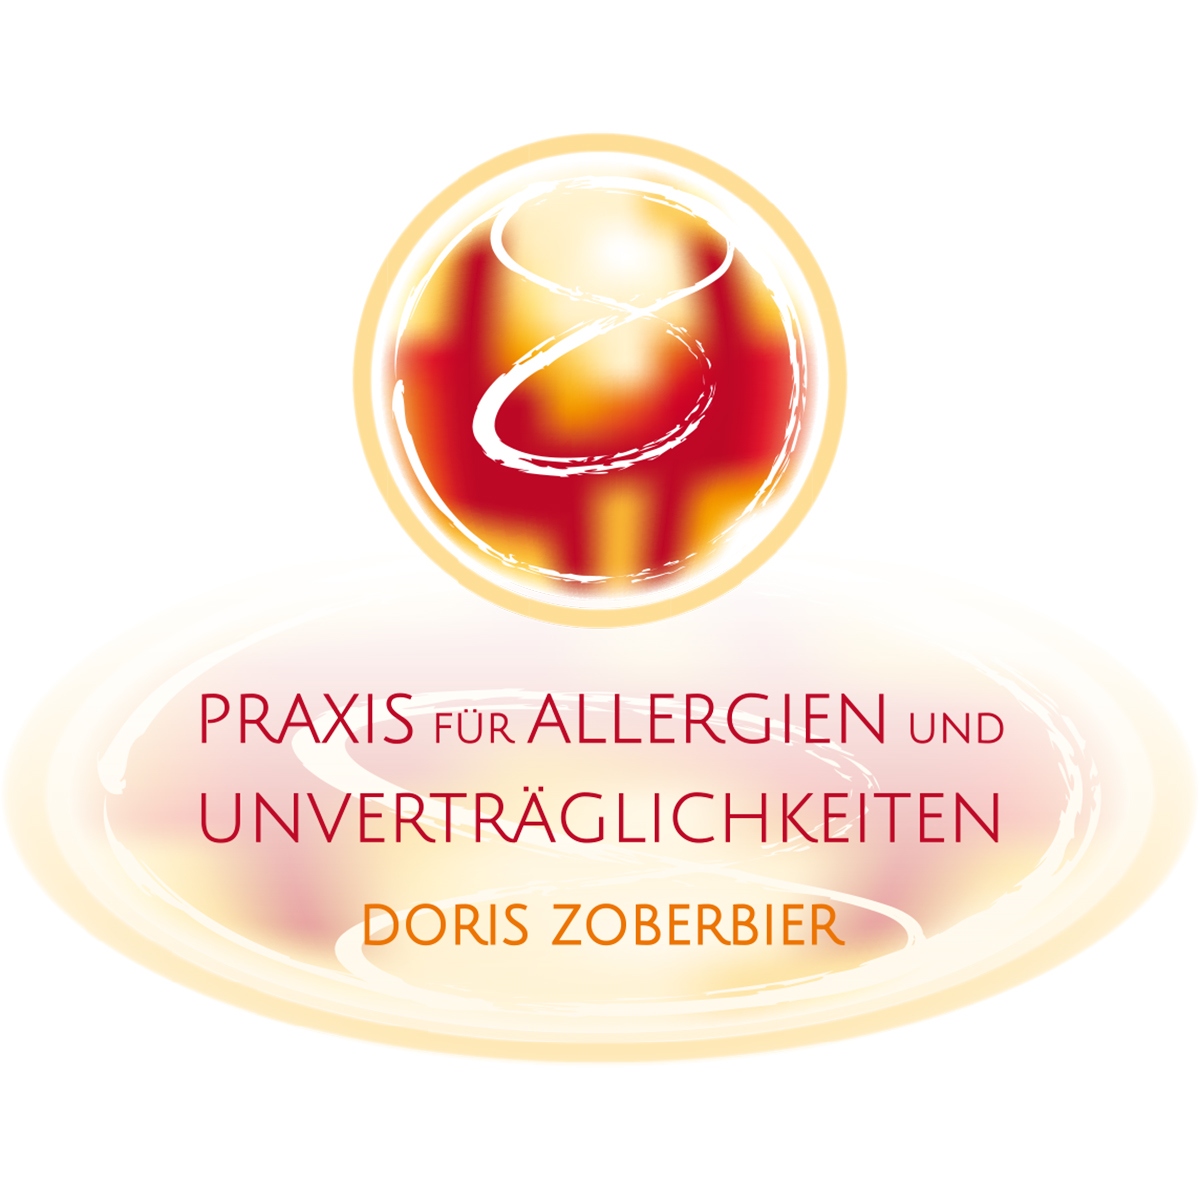 Logo erstellen, Doris Zoberbier, Heilpraktikerin